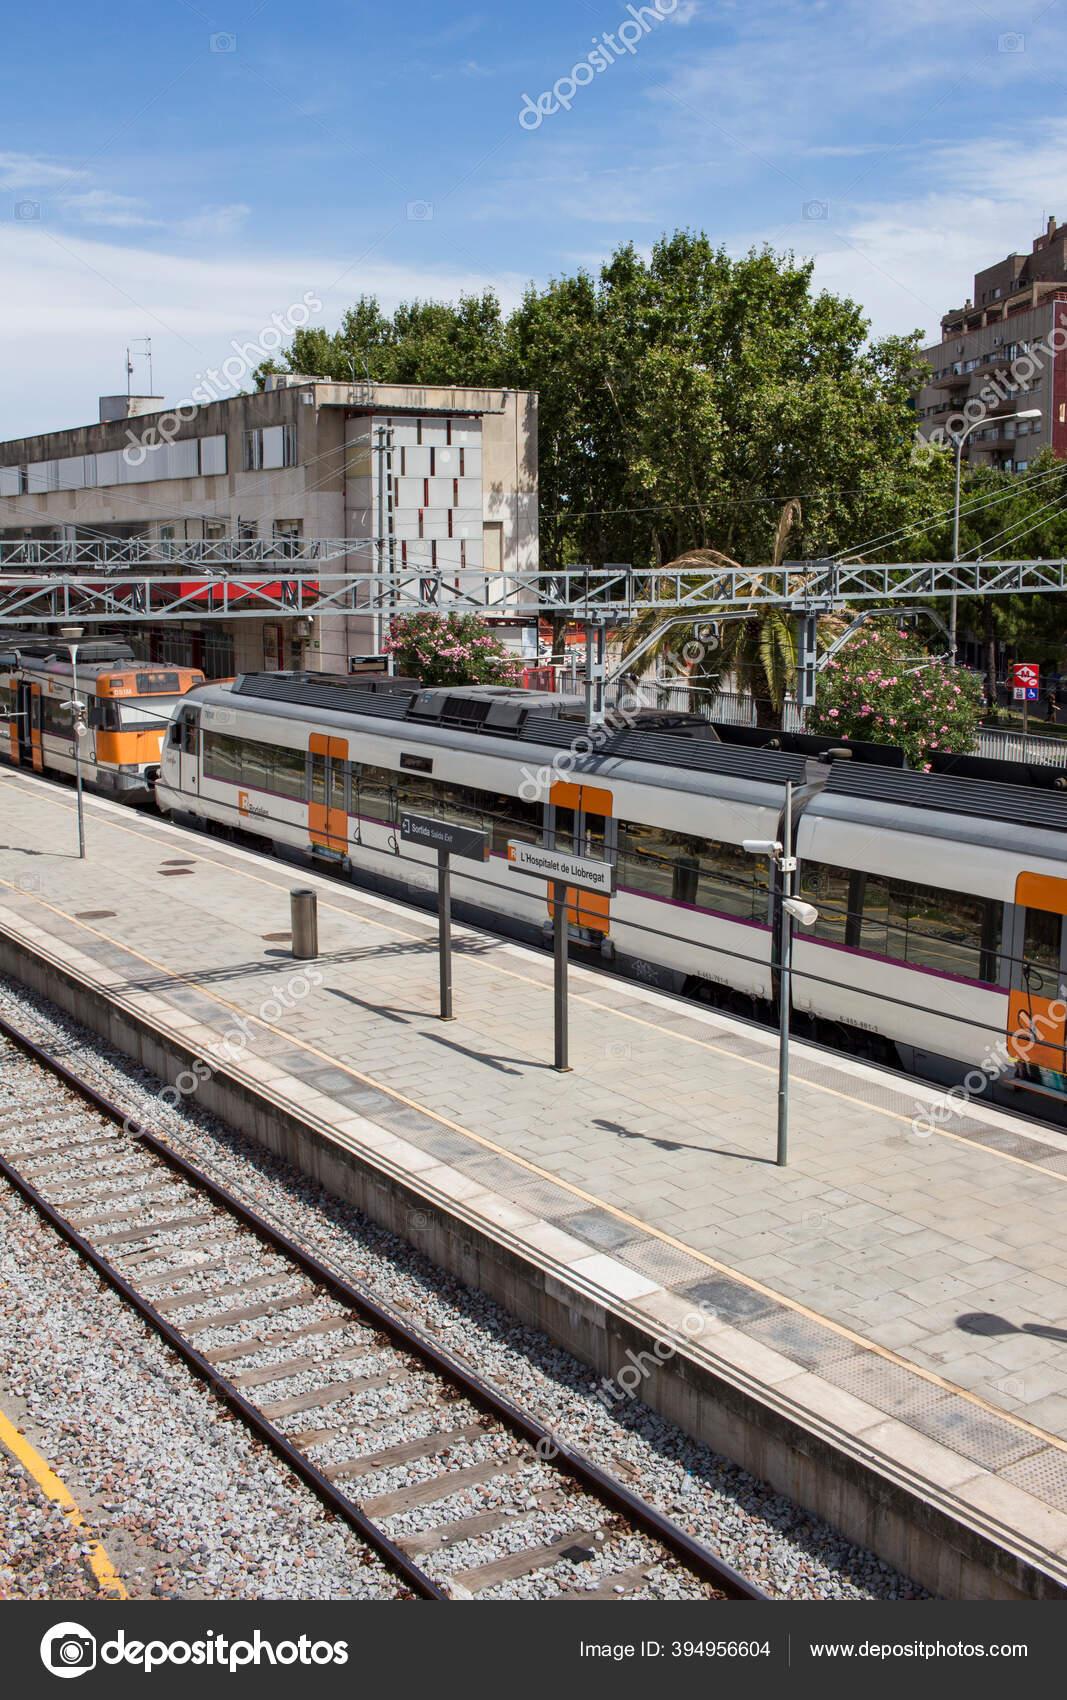 Hospitalet Llobregat Estación Tren Barcelona Cataluña España Julio 2020 Foto Editorial De Stock Elisag 394956604